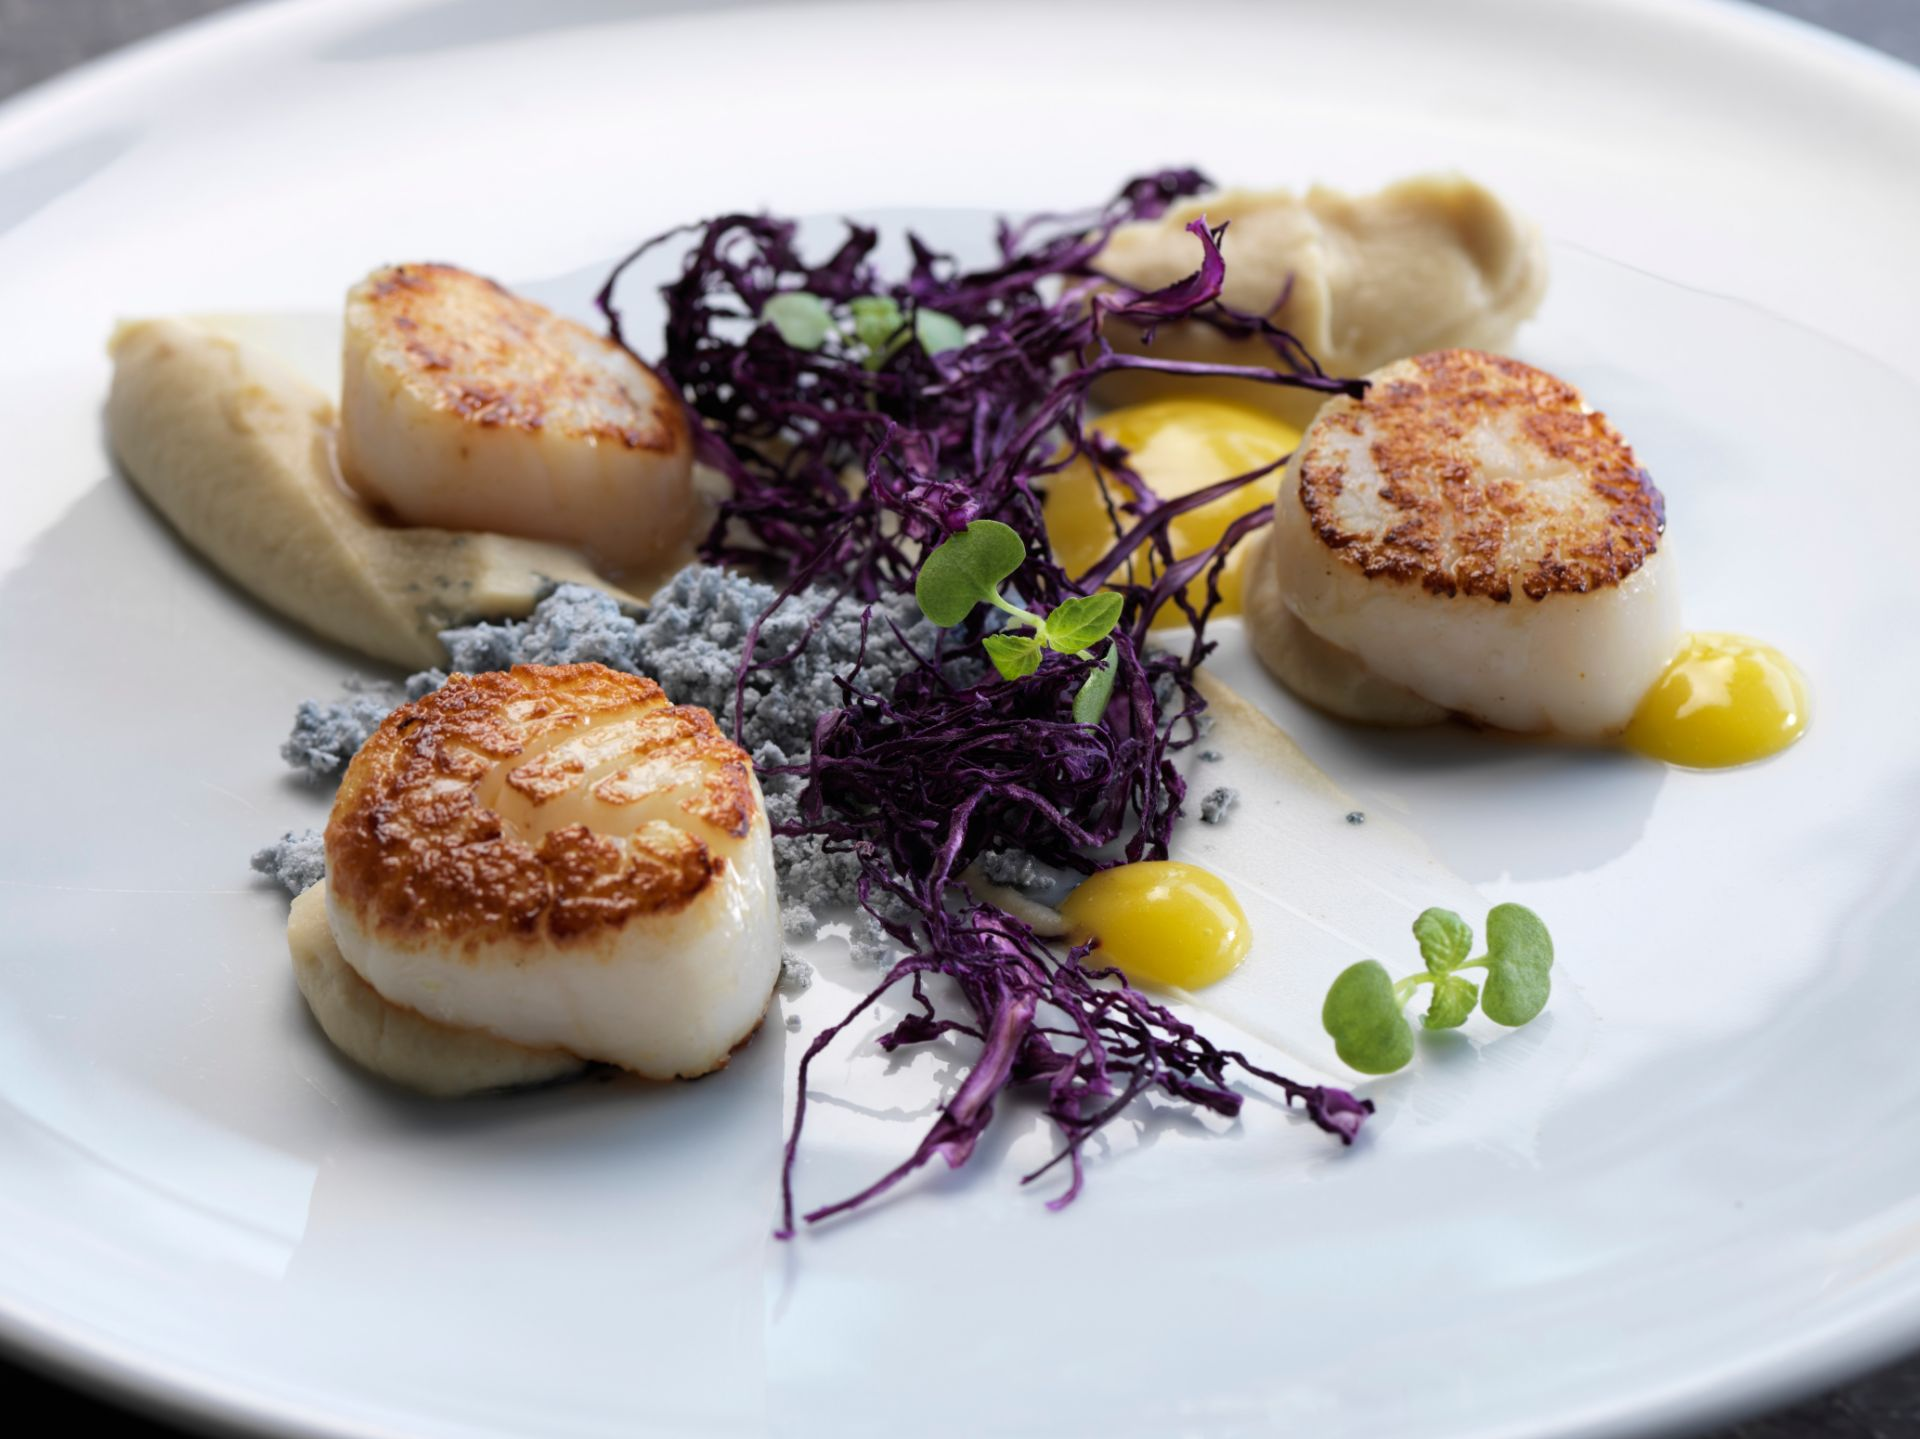 Minos Beach art hotel - Restaurant de cuisine méditerranéenne 'La Bouillabaisse'